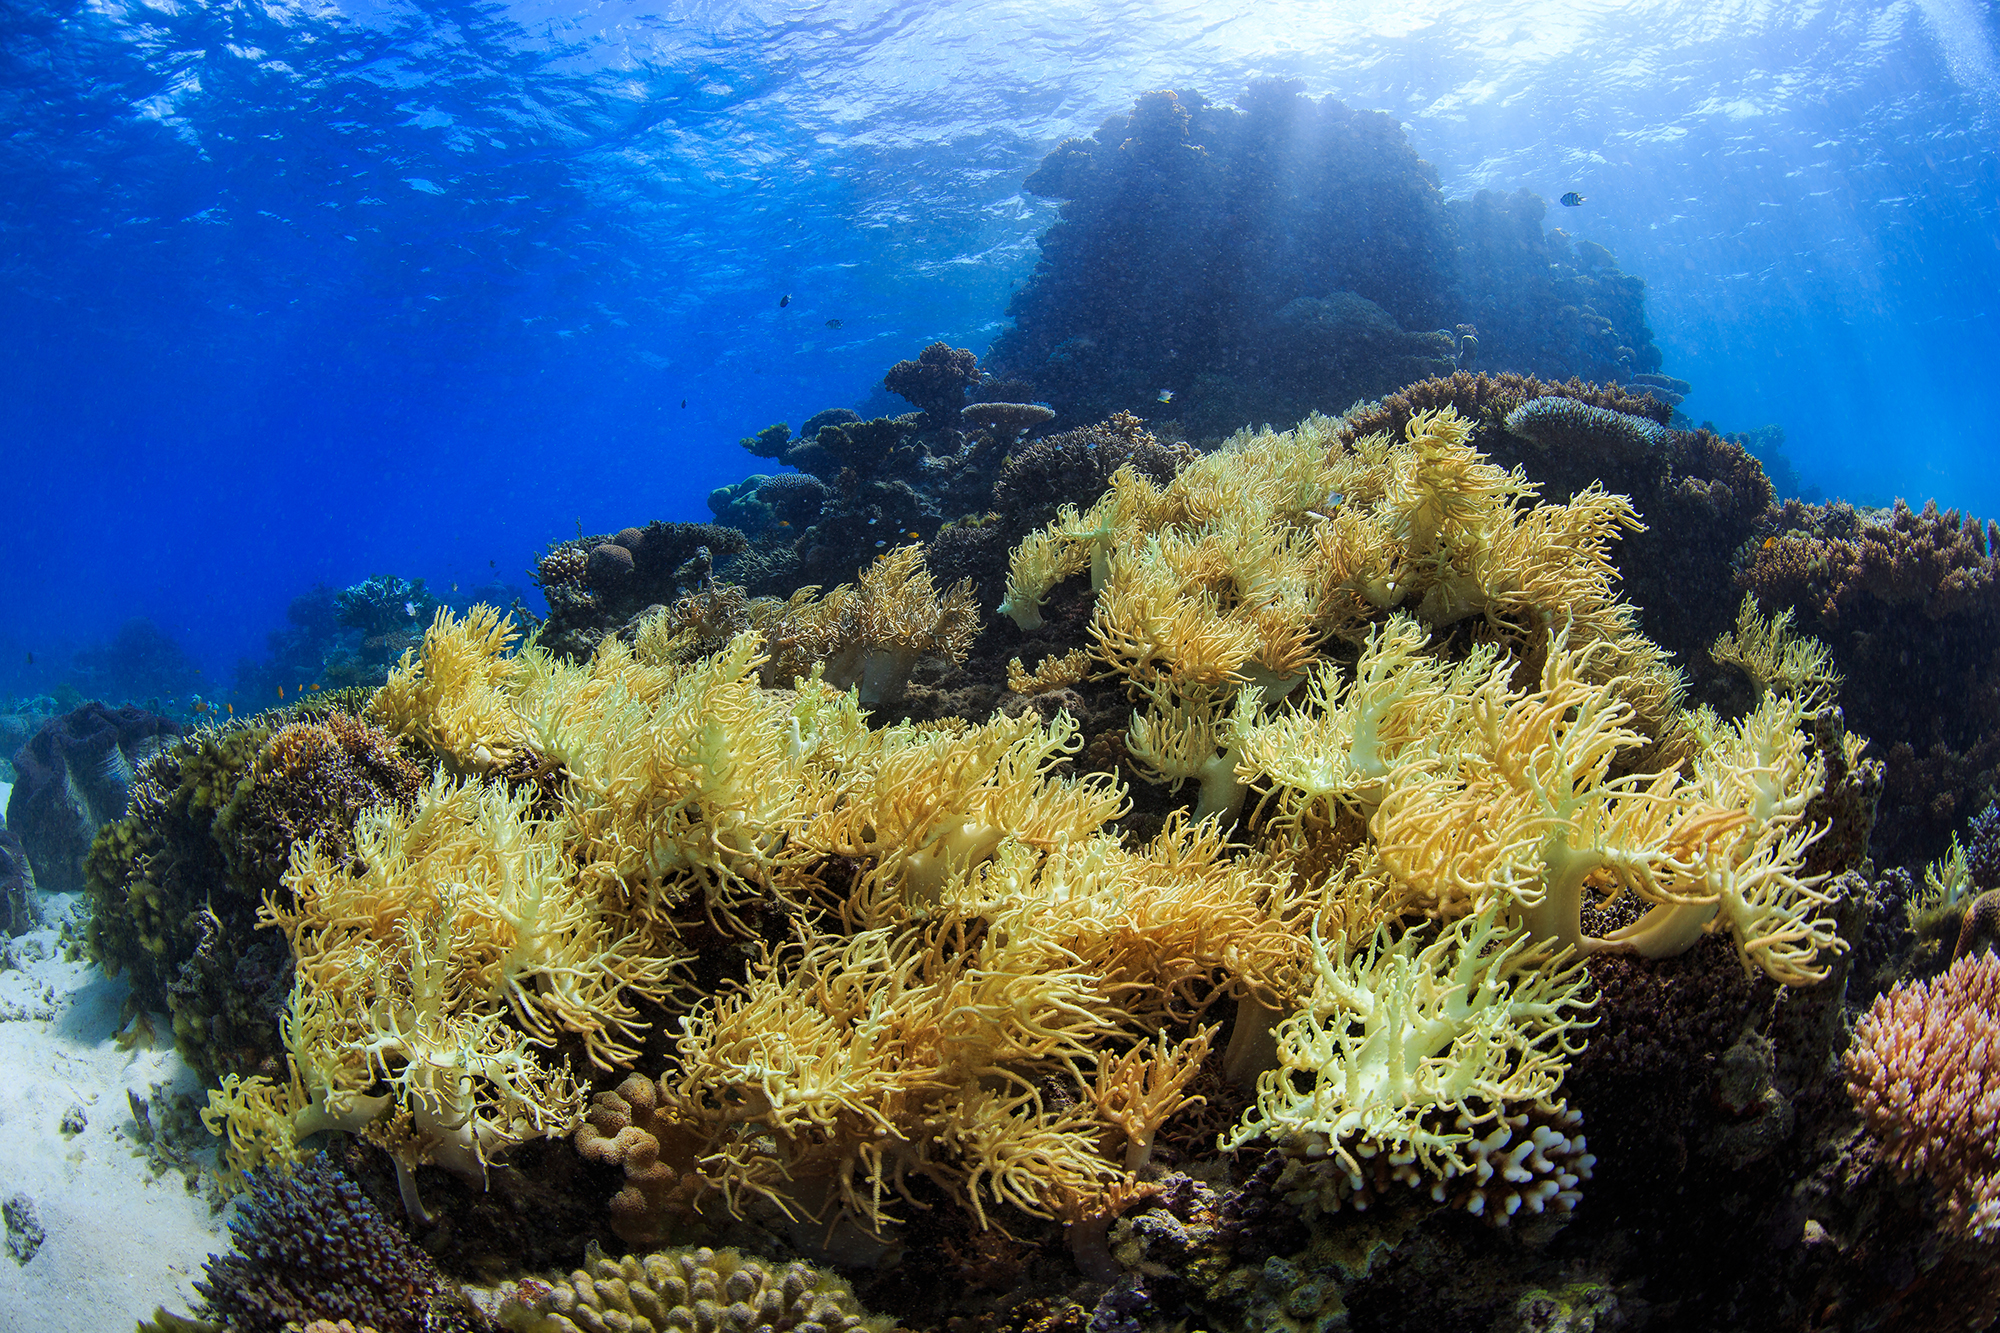 GREAT BARRIER REEF, Great barrier reef CREDIT: YEN-YI LEE / CORAL REEF IMAGE BANK